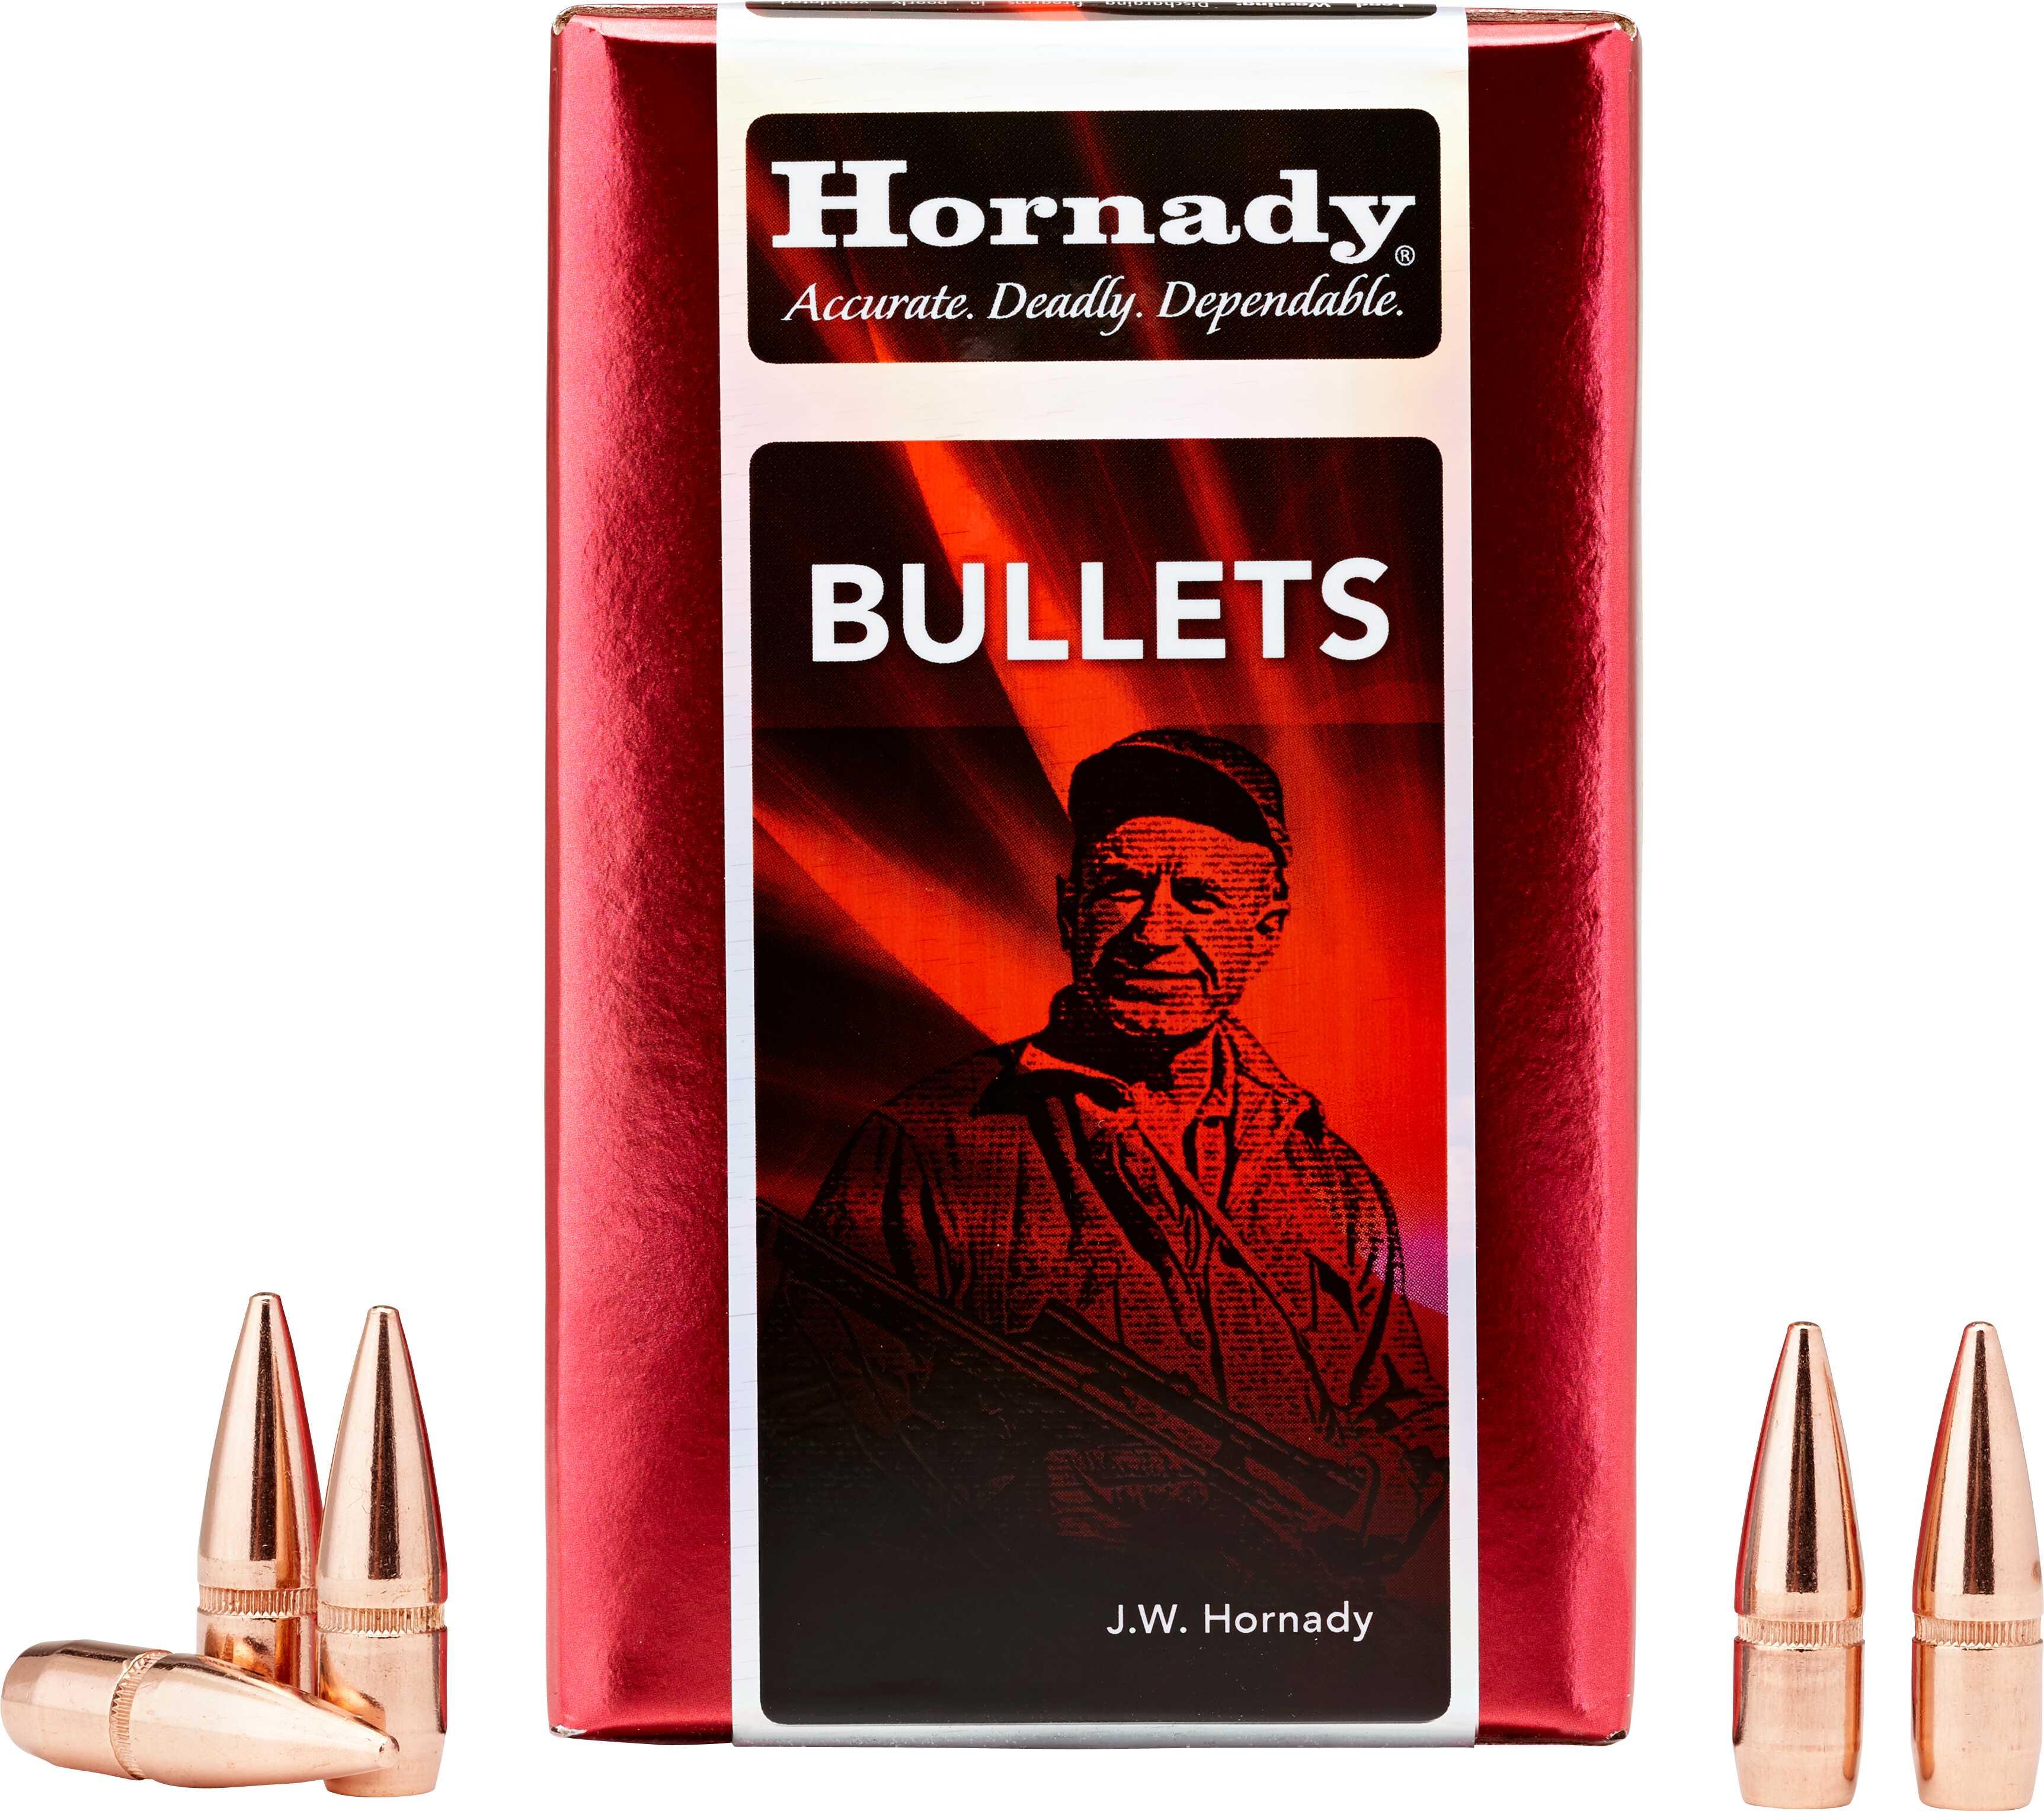 Hornady 7mm Bullets 175 Grain SP Per 100 Md: 2850